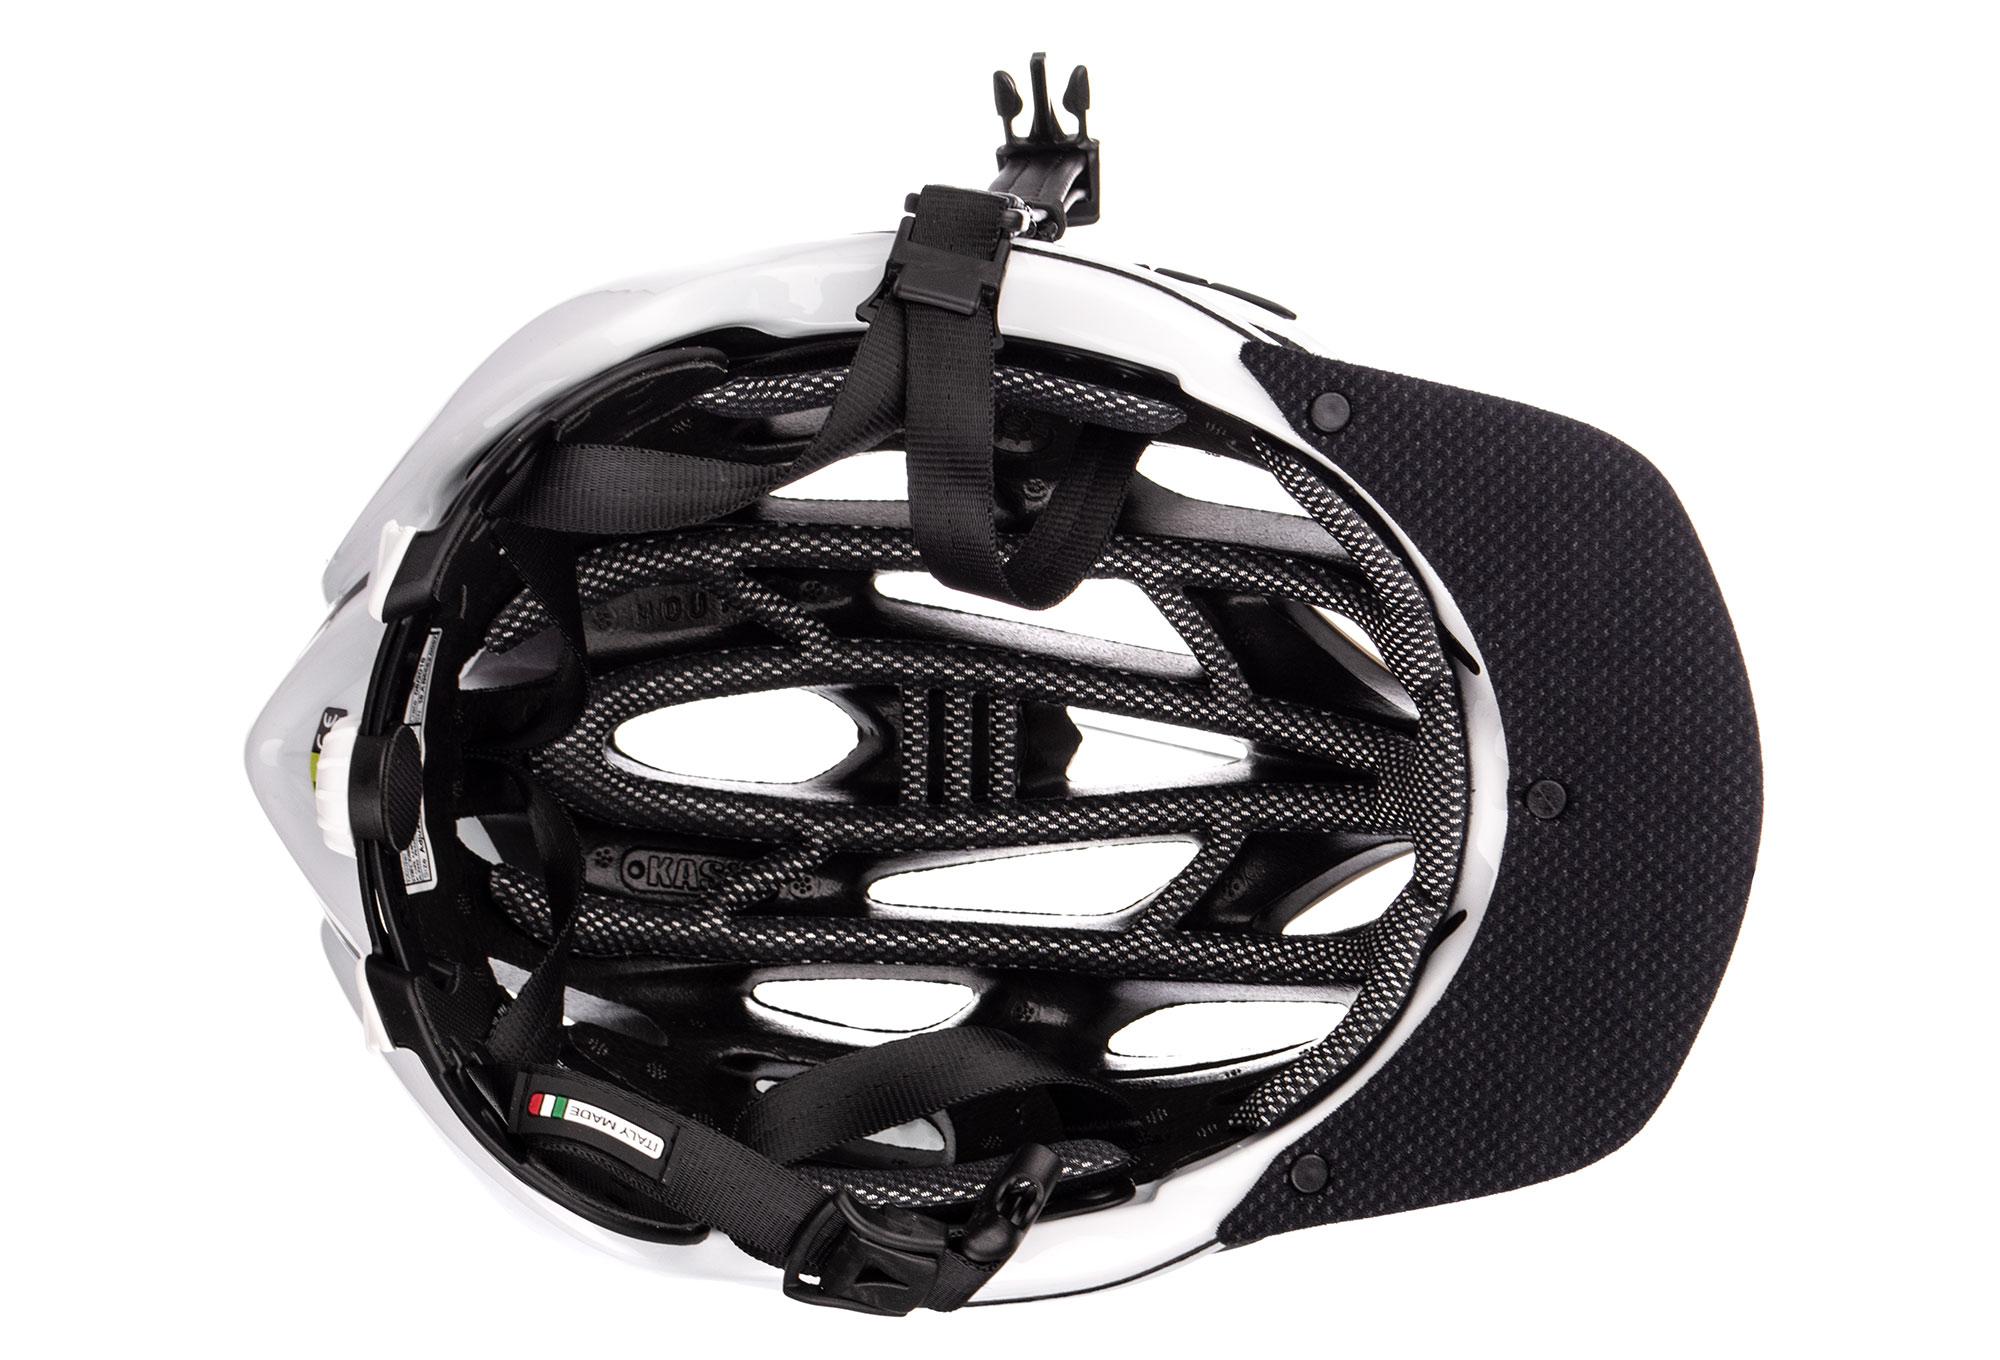 Red S:48-56. M:52-58. L:59-62cm KASK MOJITO X PEAK Road Cycling Helmet